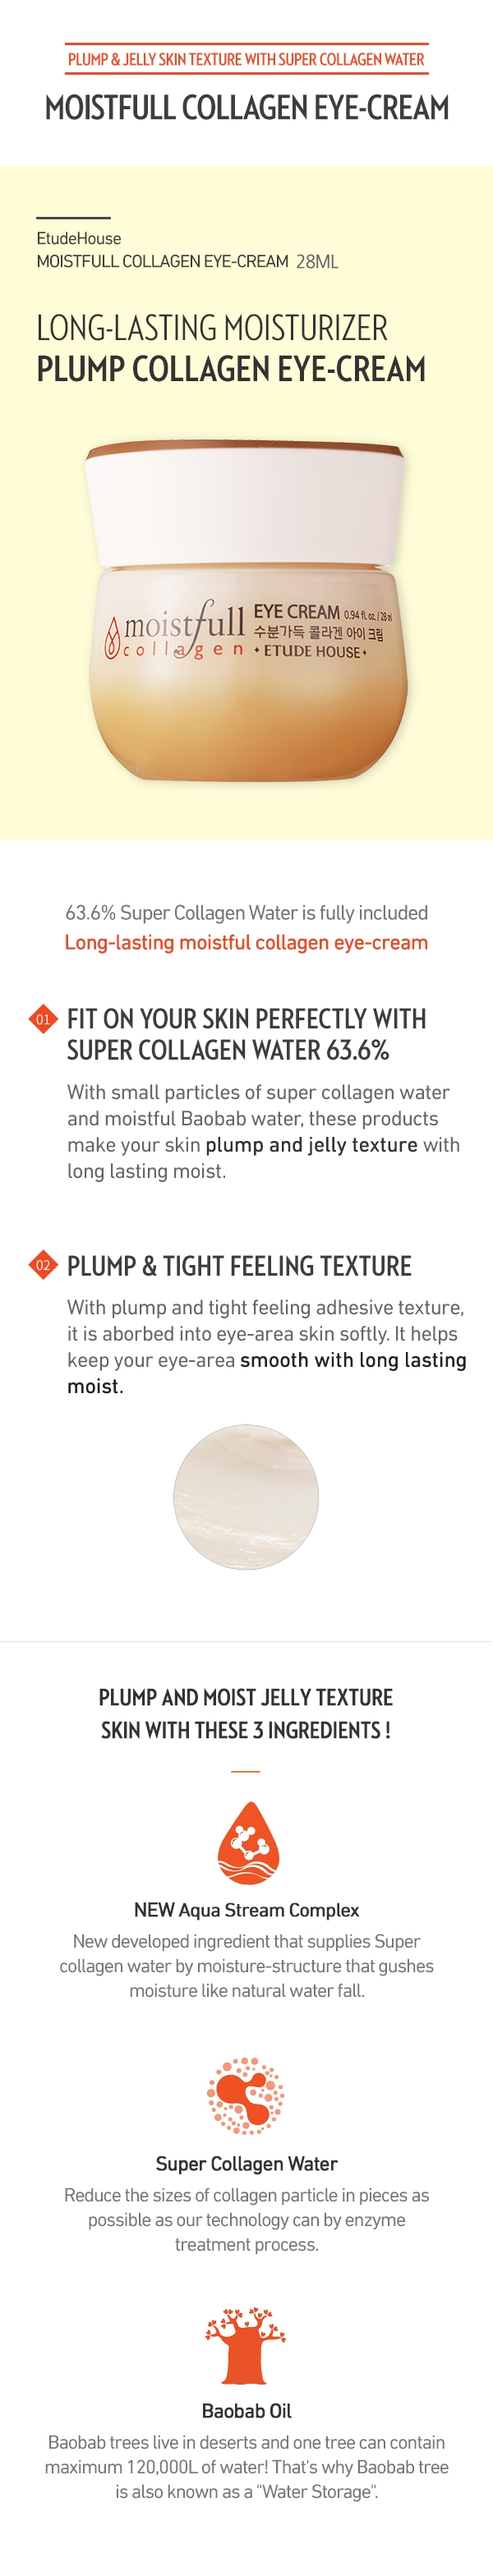 Moistfull Collagen Eye Cream 28ml How to use Description Ingredients